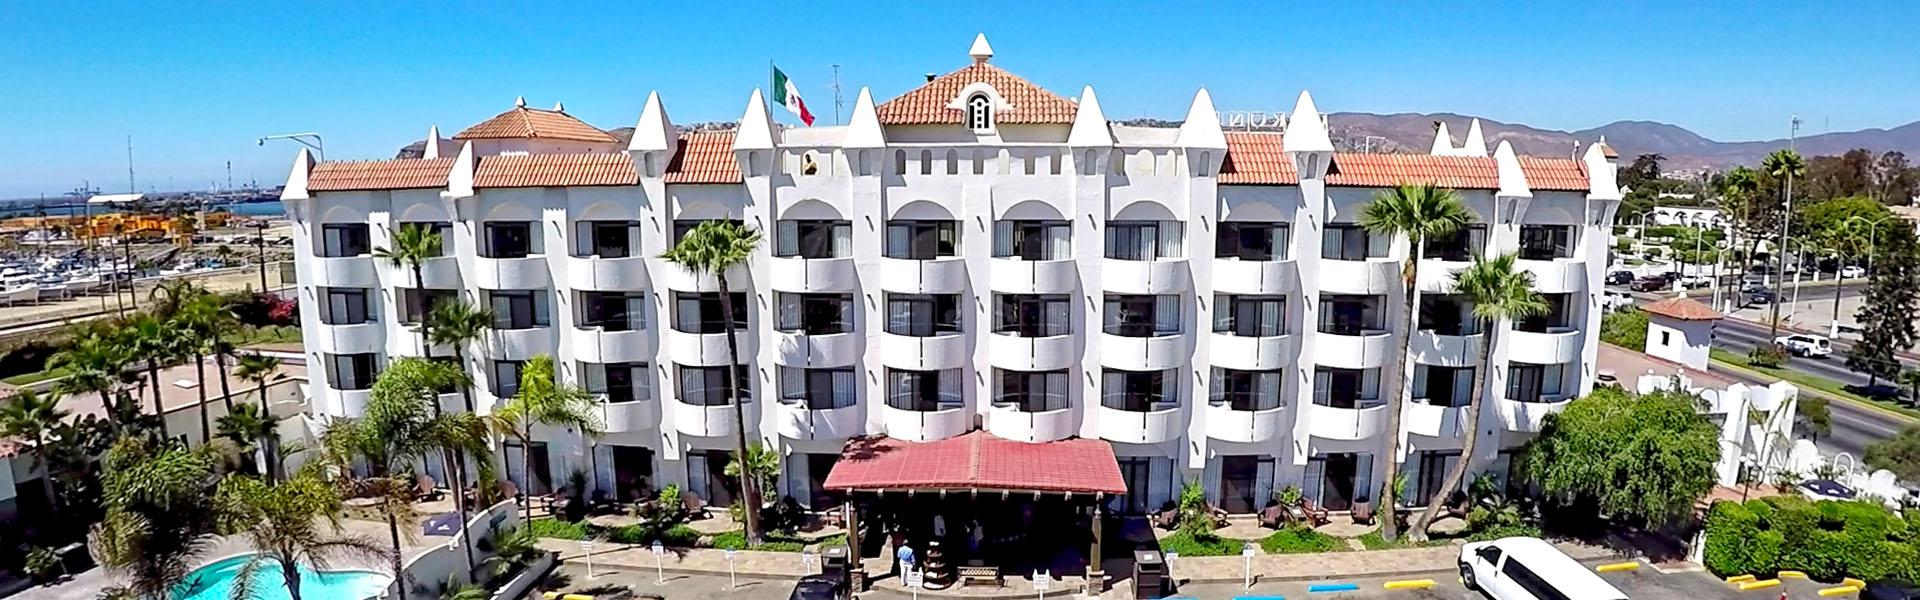 Hotel Corona en Ensenada Baja California